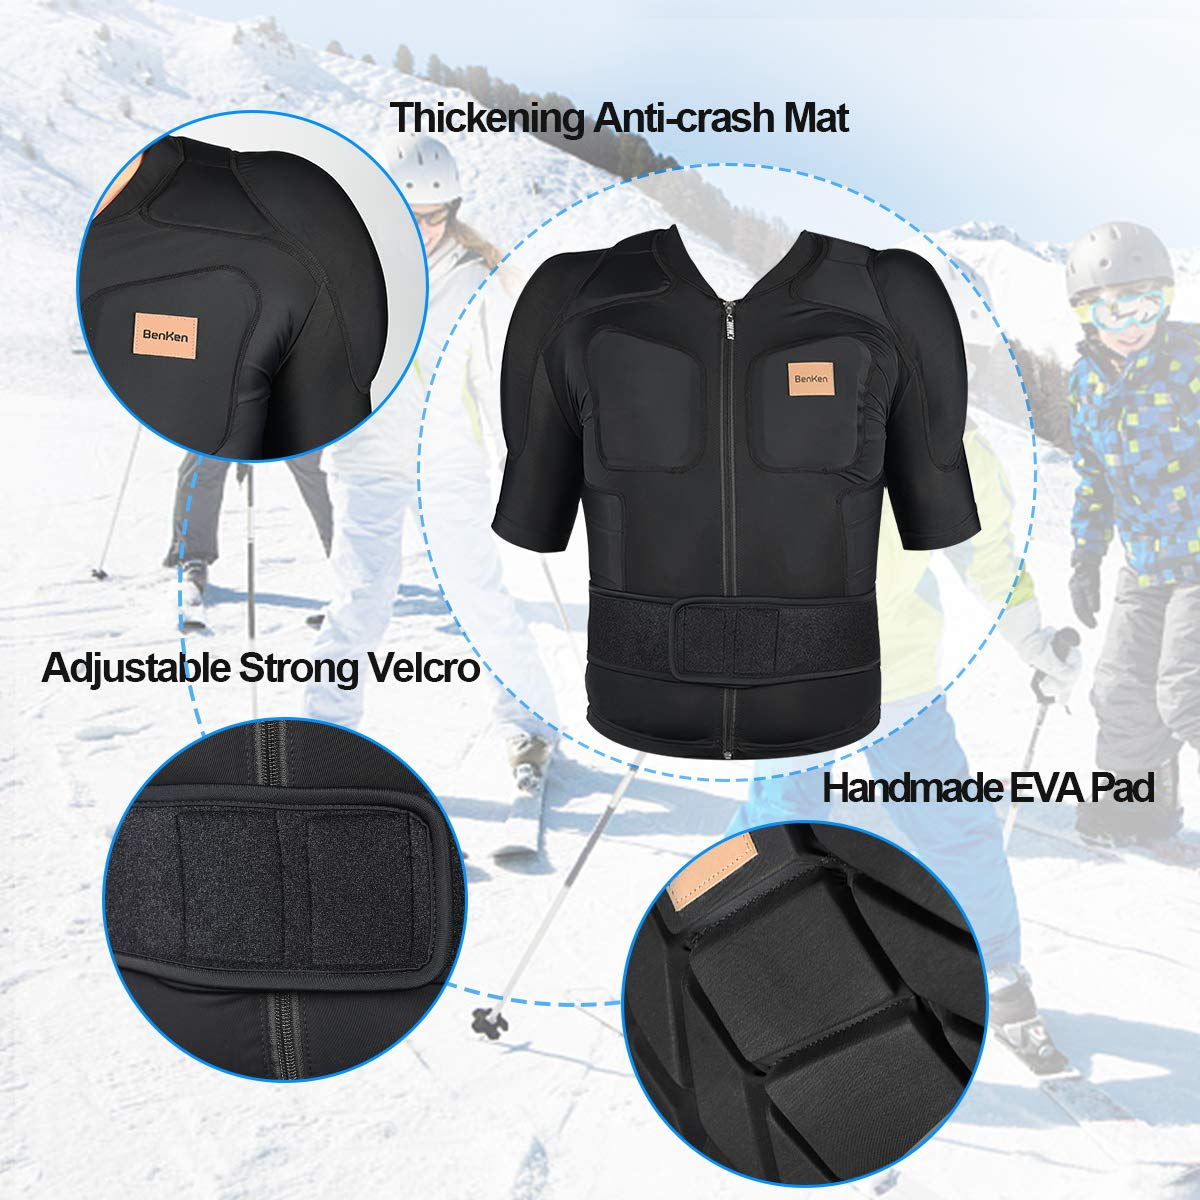 BENKEN Body da sci a maniche lunghe Protector Guard Gear Pad con fodera motore torace spalla schiena giacca regolabile donna uomo Top Upper Padded Armor